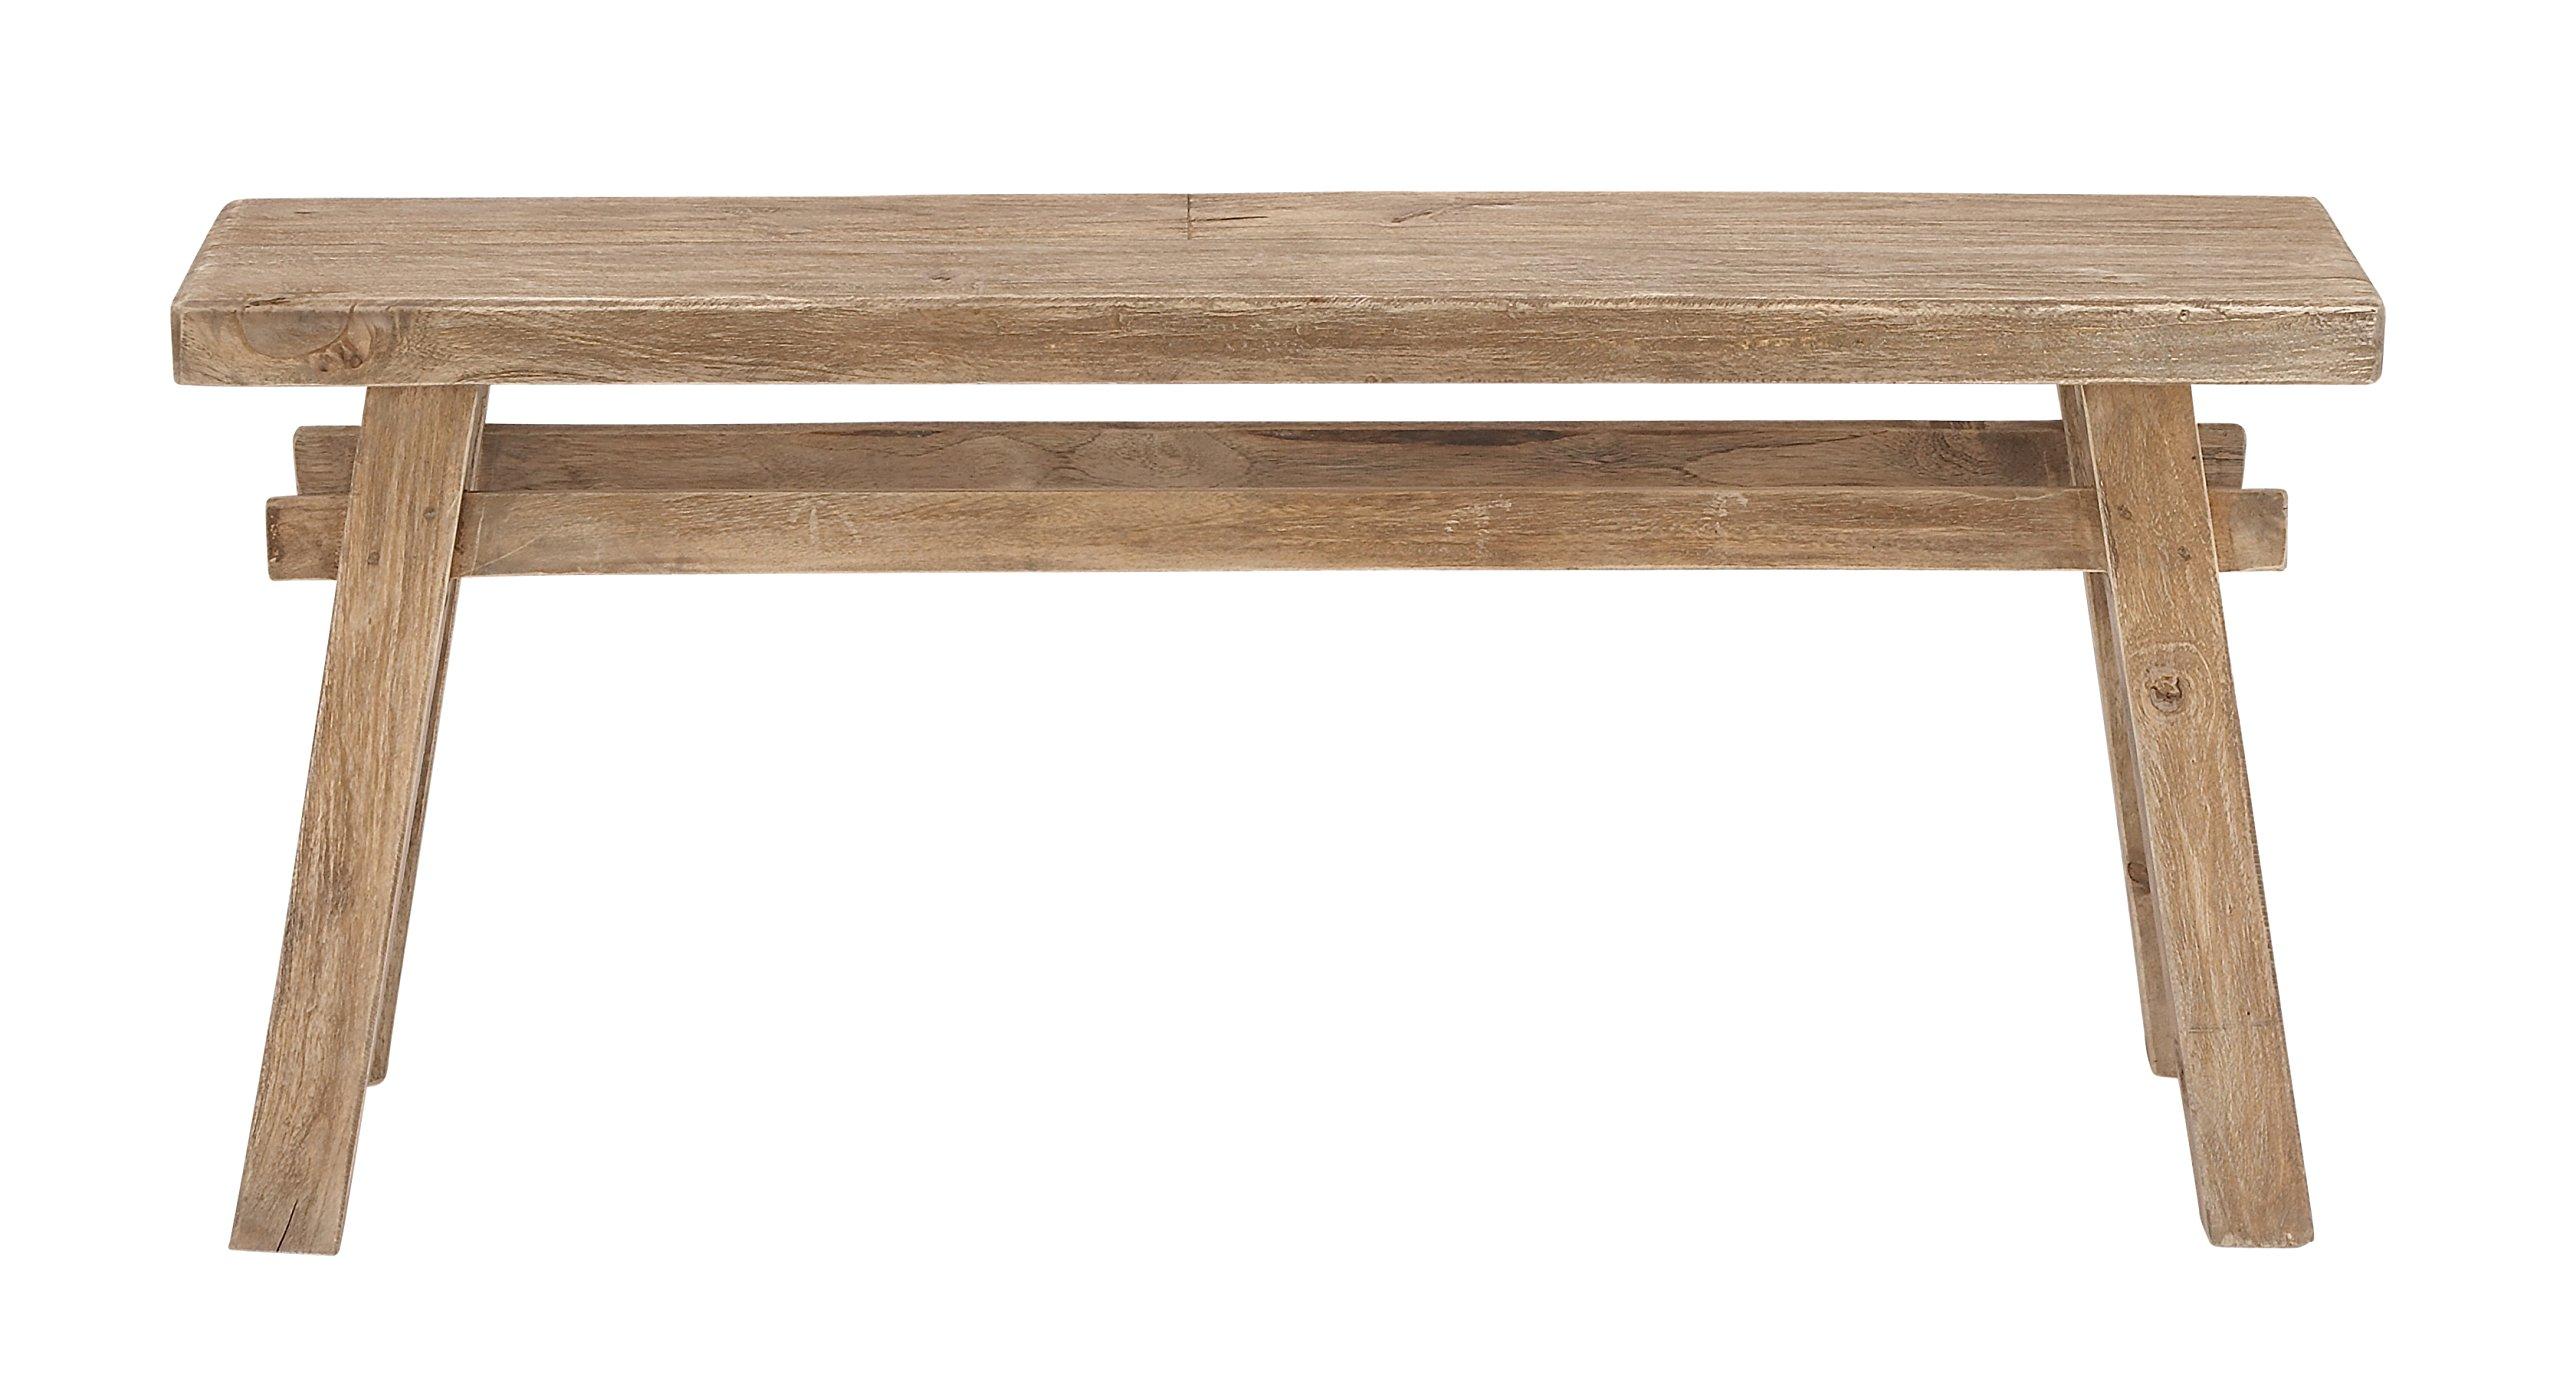 Benzara 45265 Classy Wood Bench